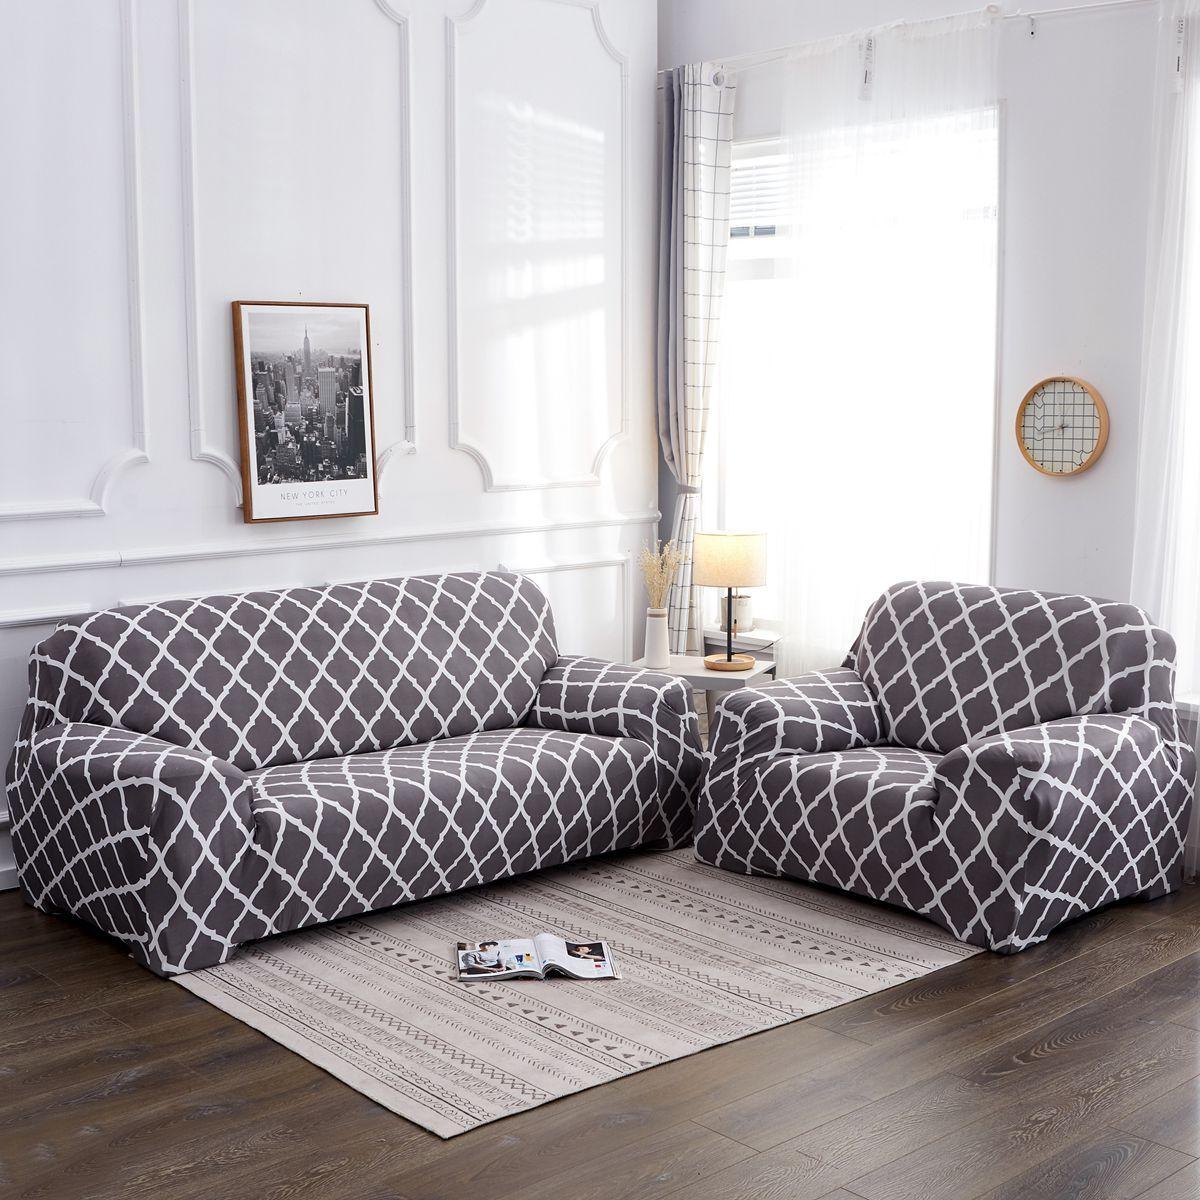 1 2 3 4 Seater Elastic Sofa Covers